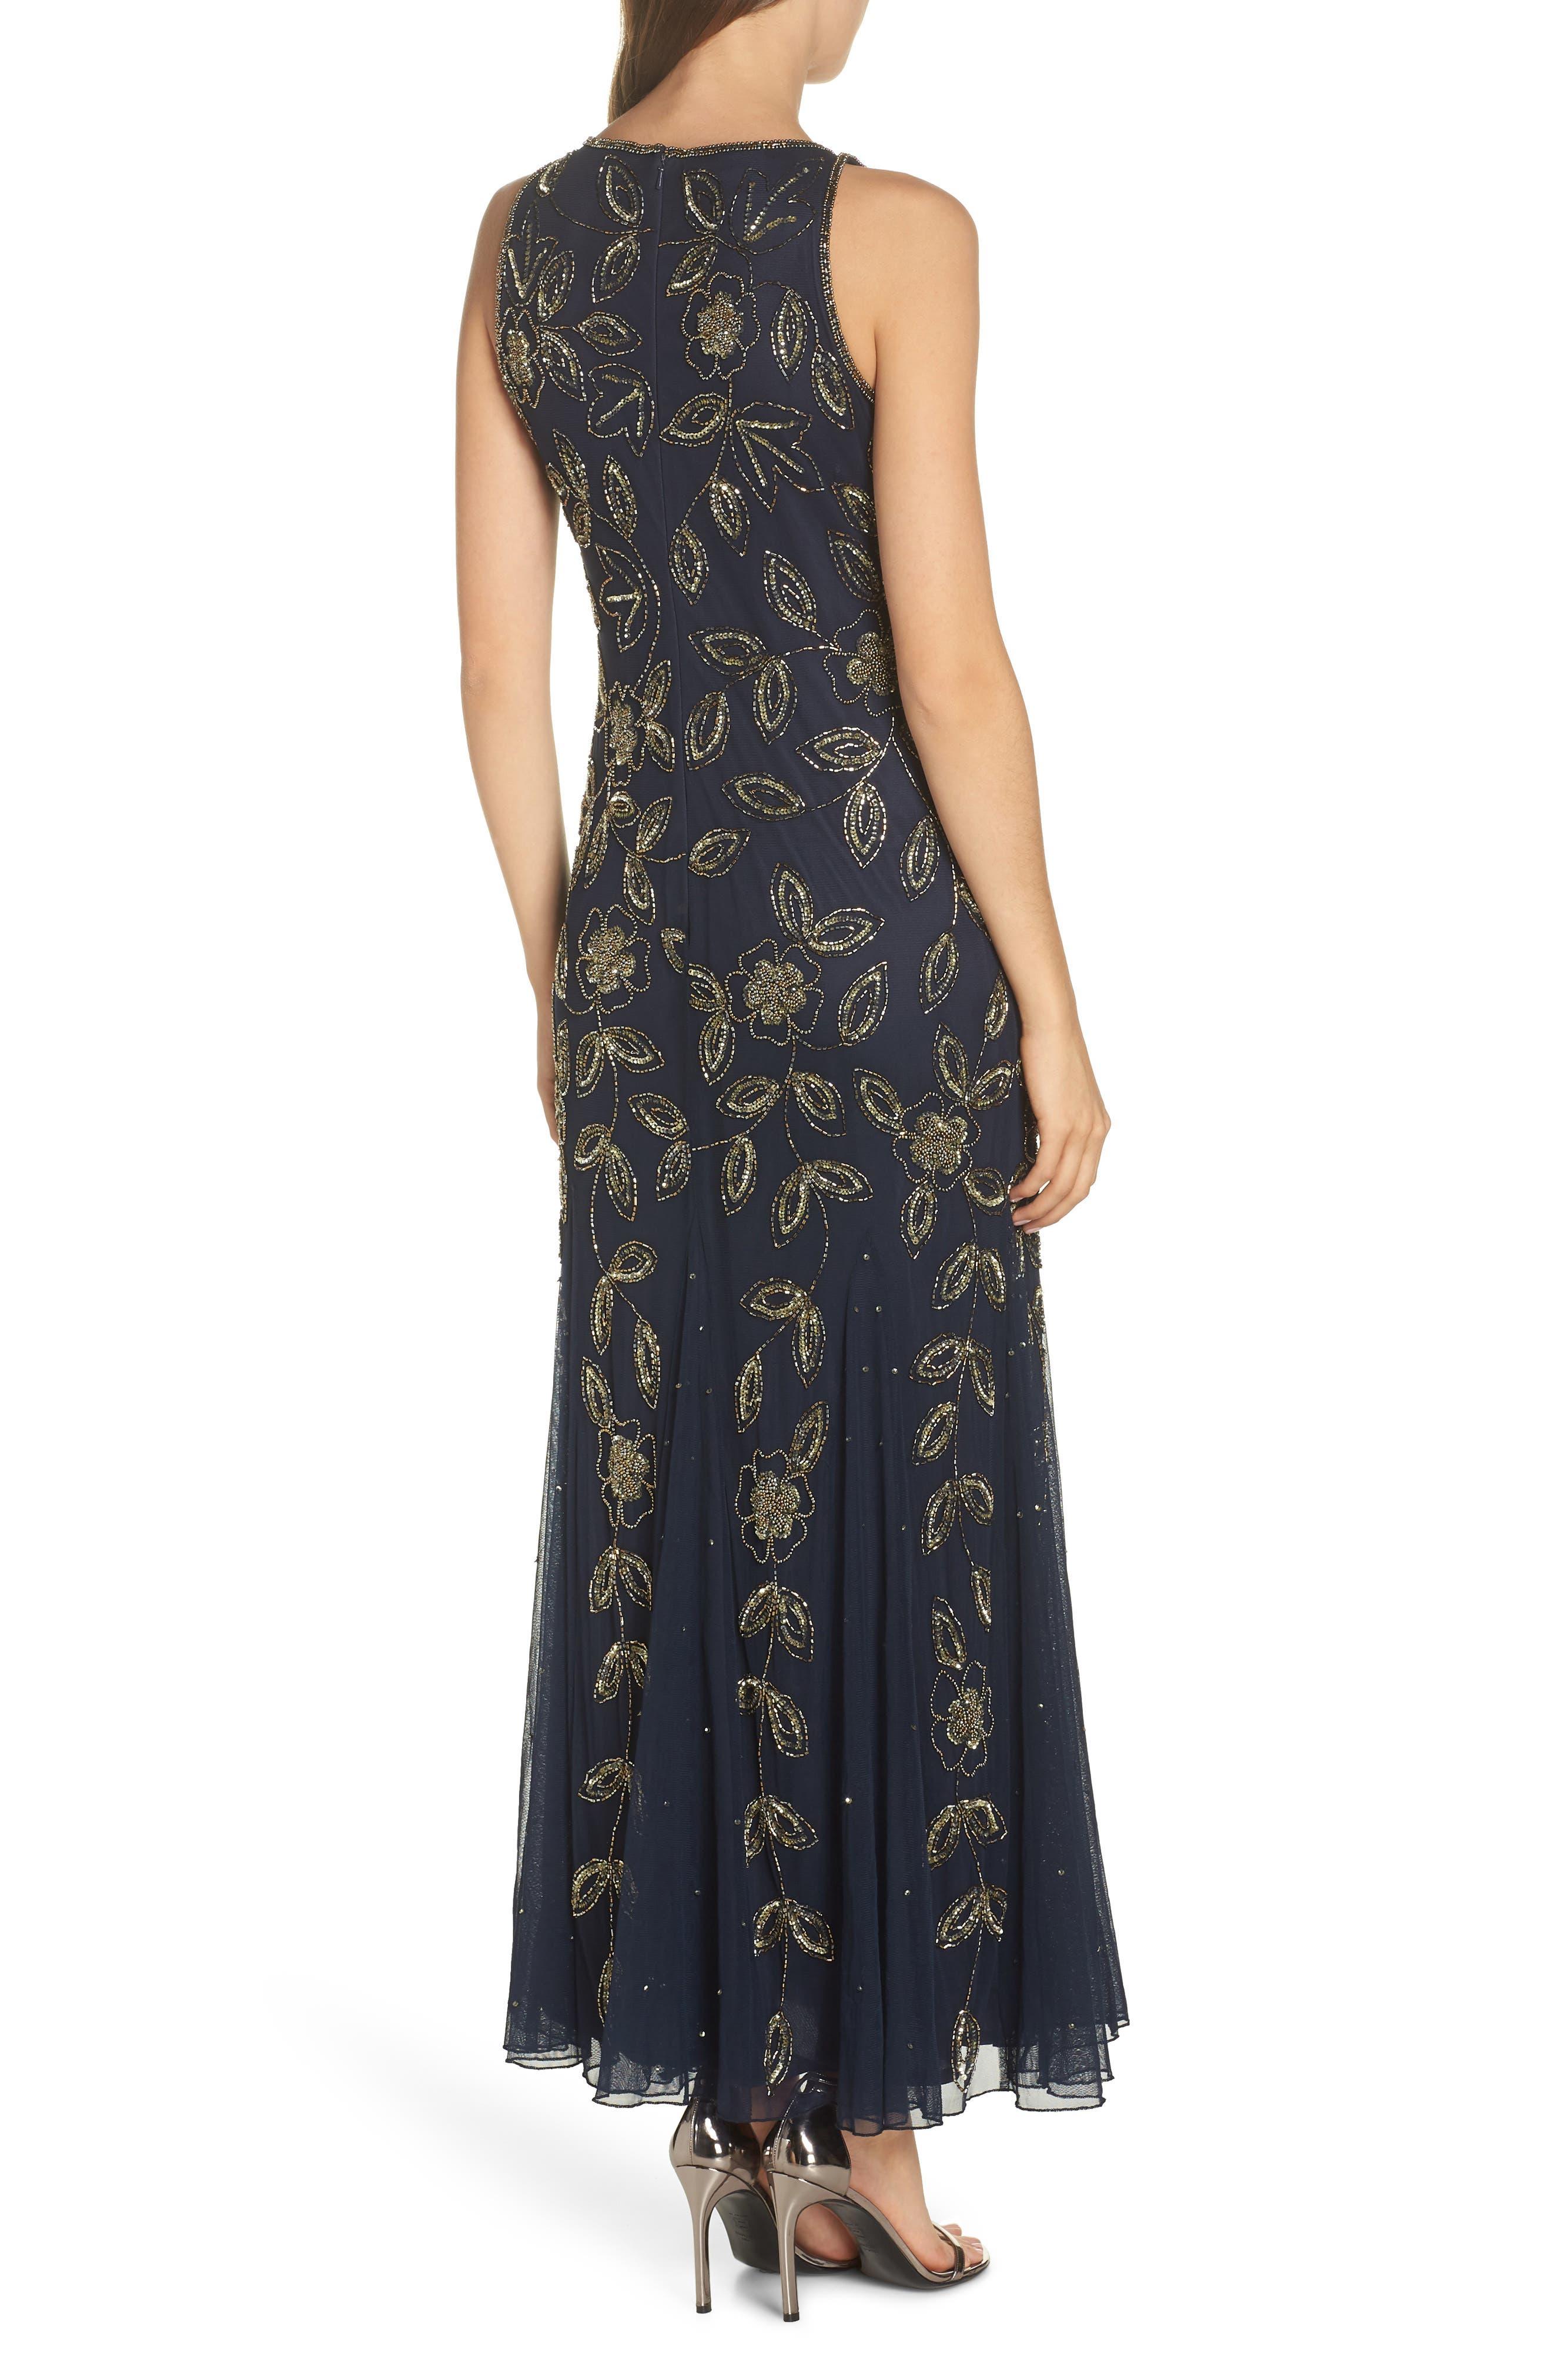 PISARRO NIGHTS, Beaded Godet Gown, Alternate thumbnail 2, color, 410